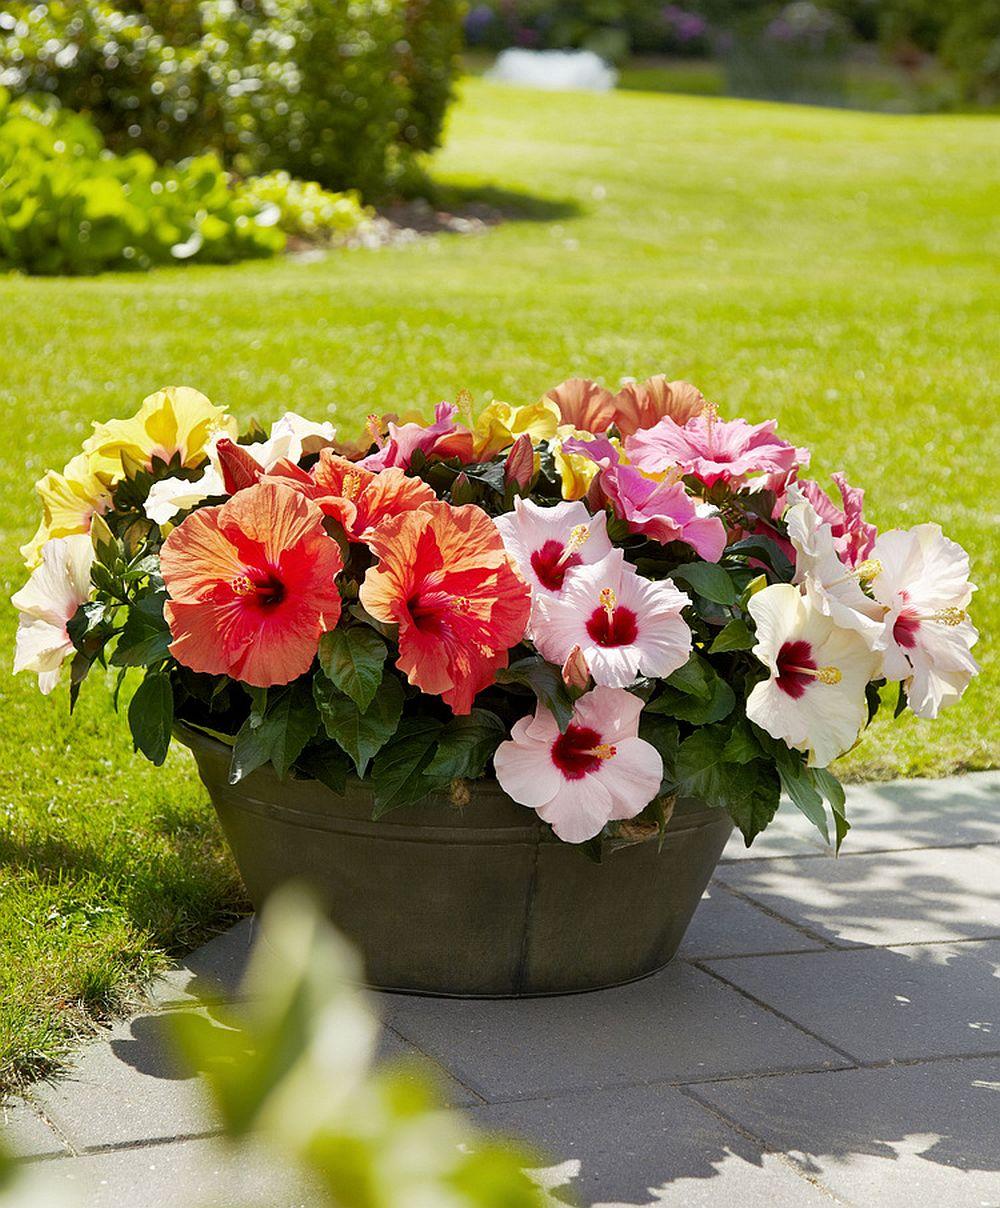 produse parazitare pentru trandafiri